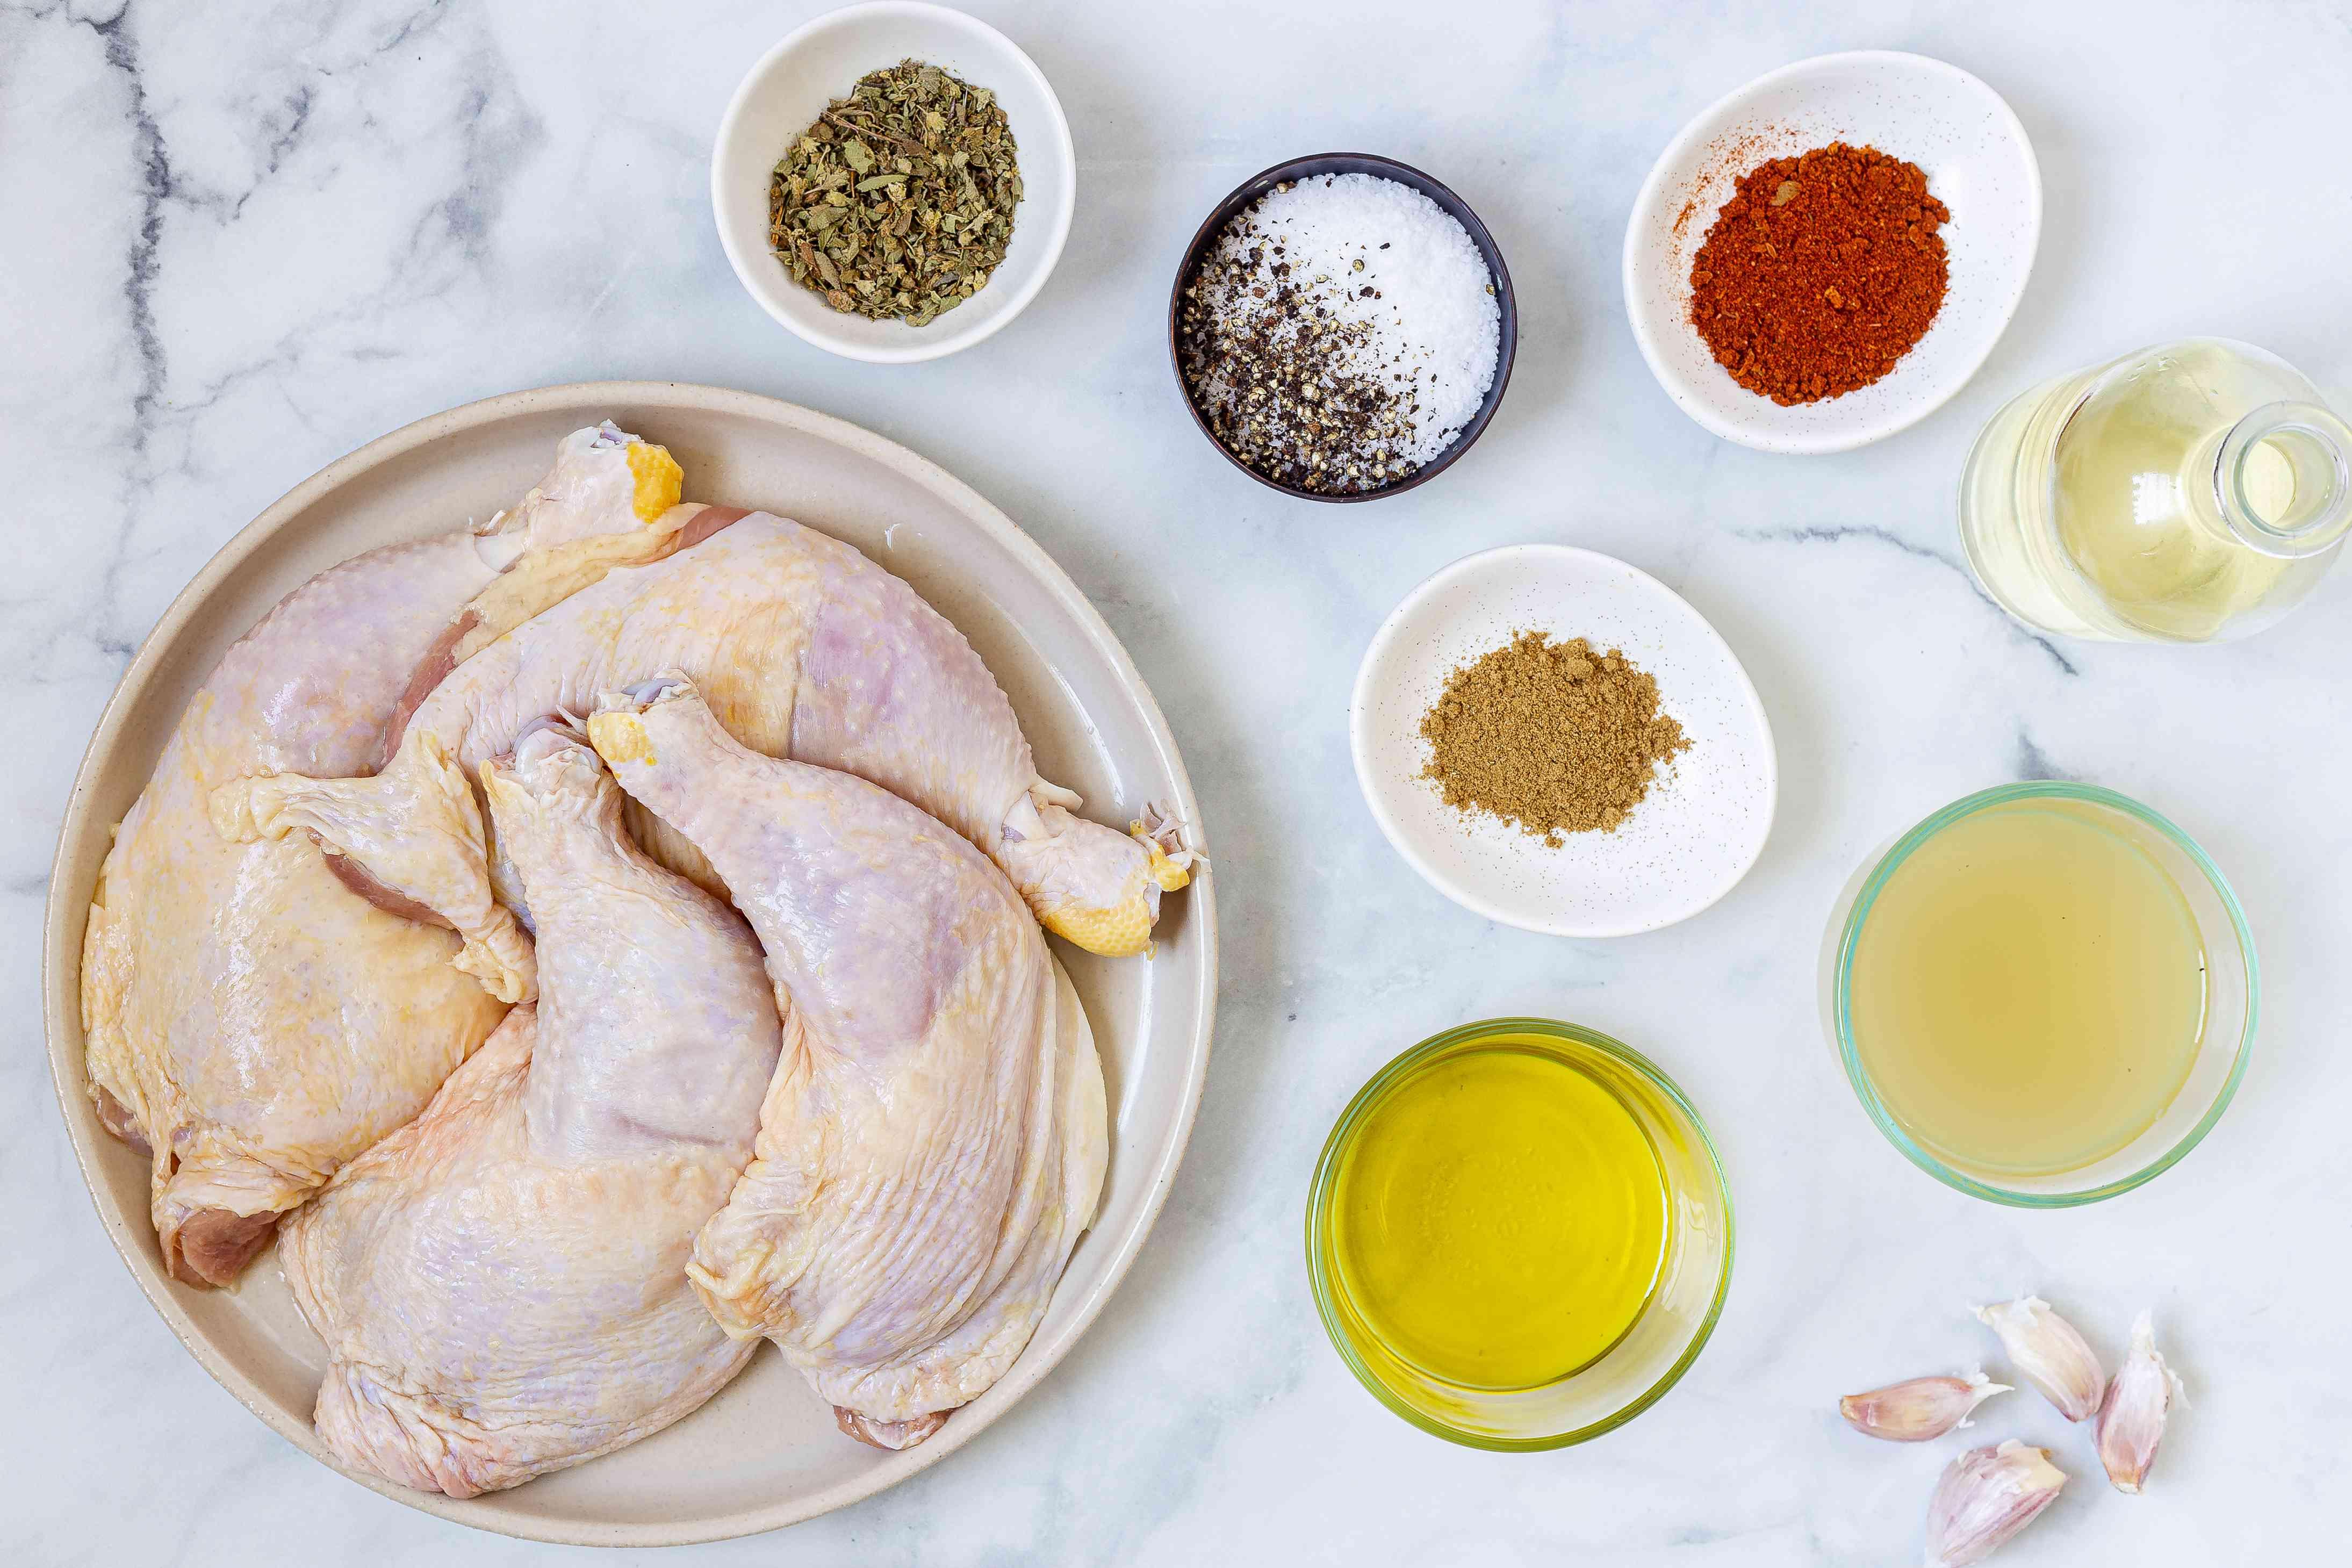 Ingredients for making garlic roasted chicken legs